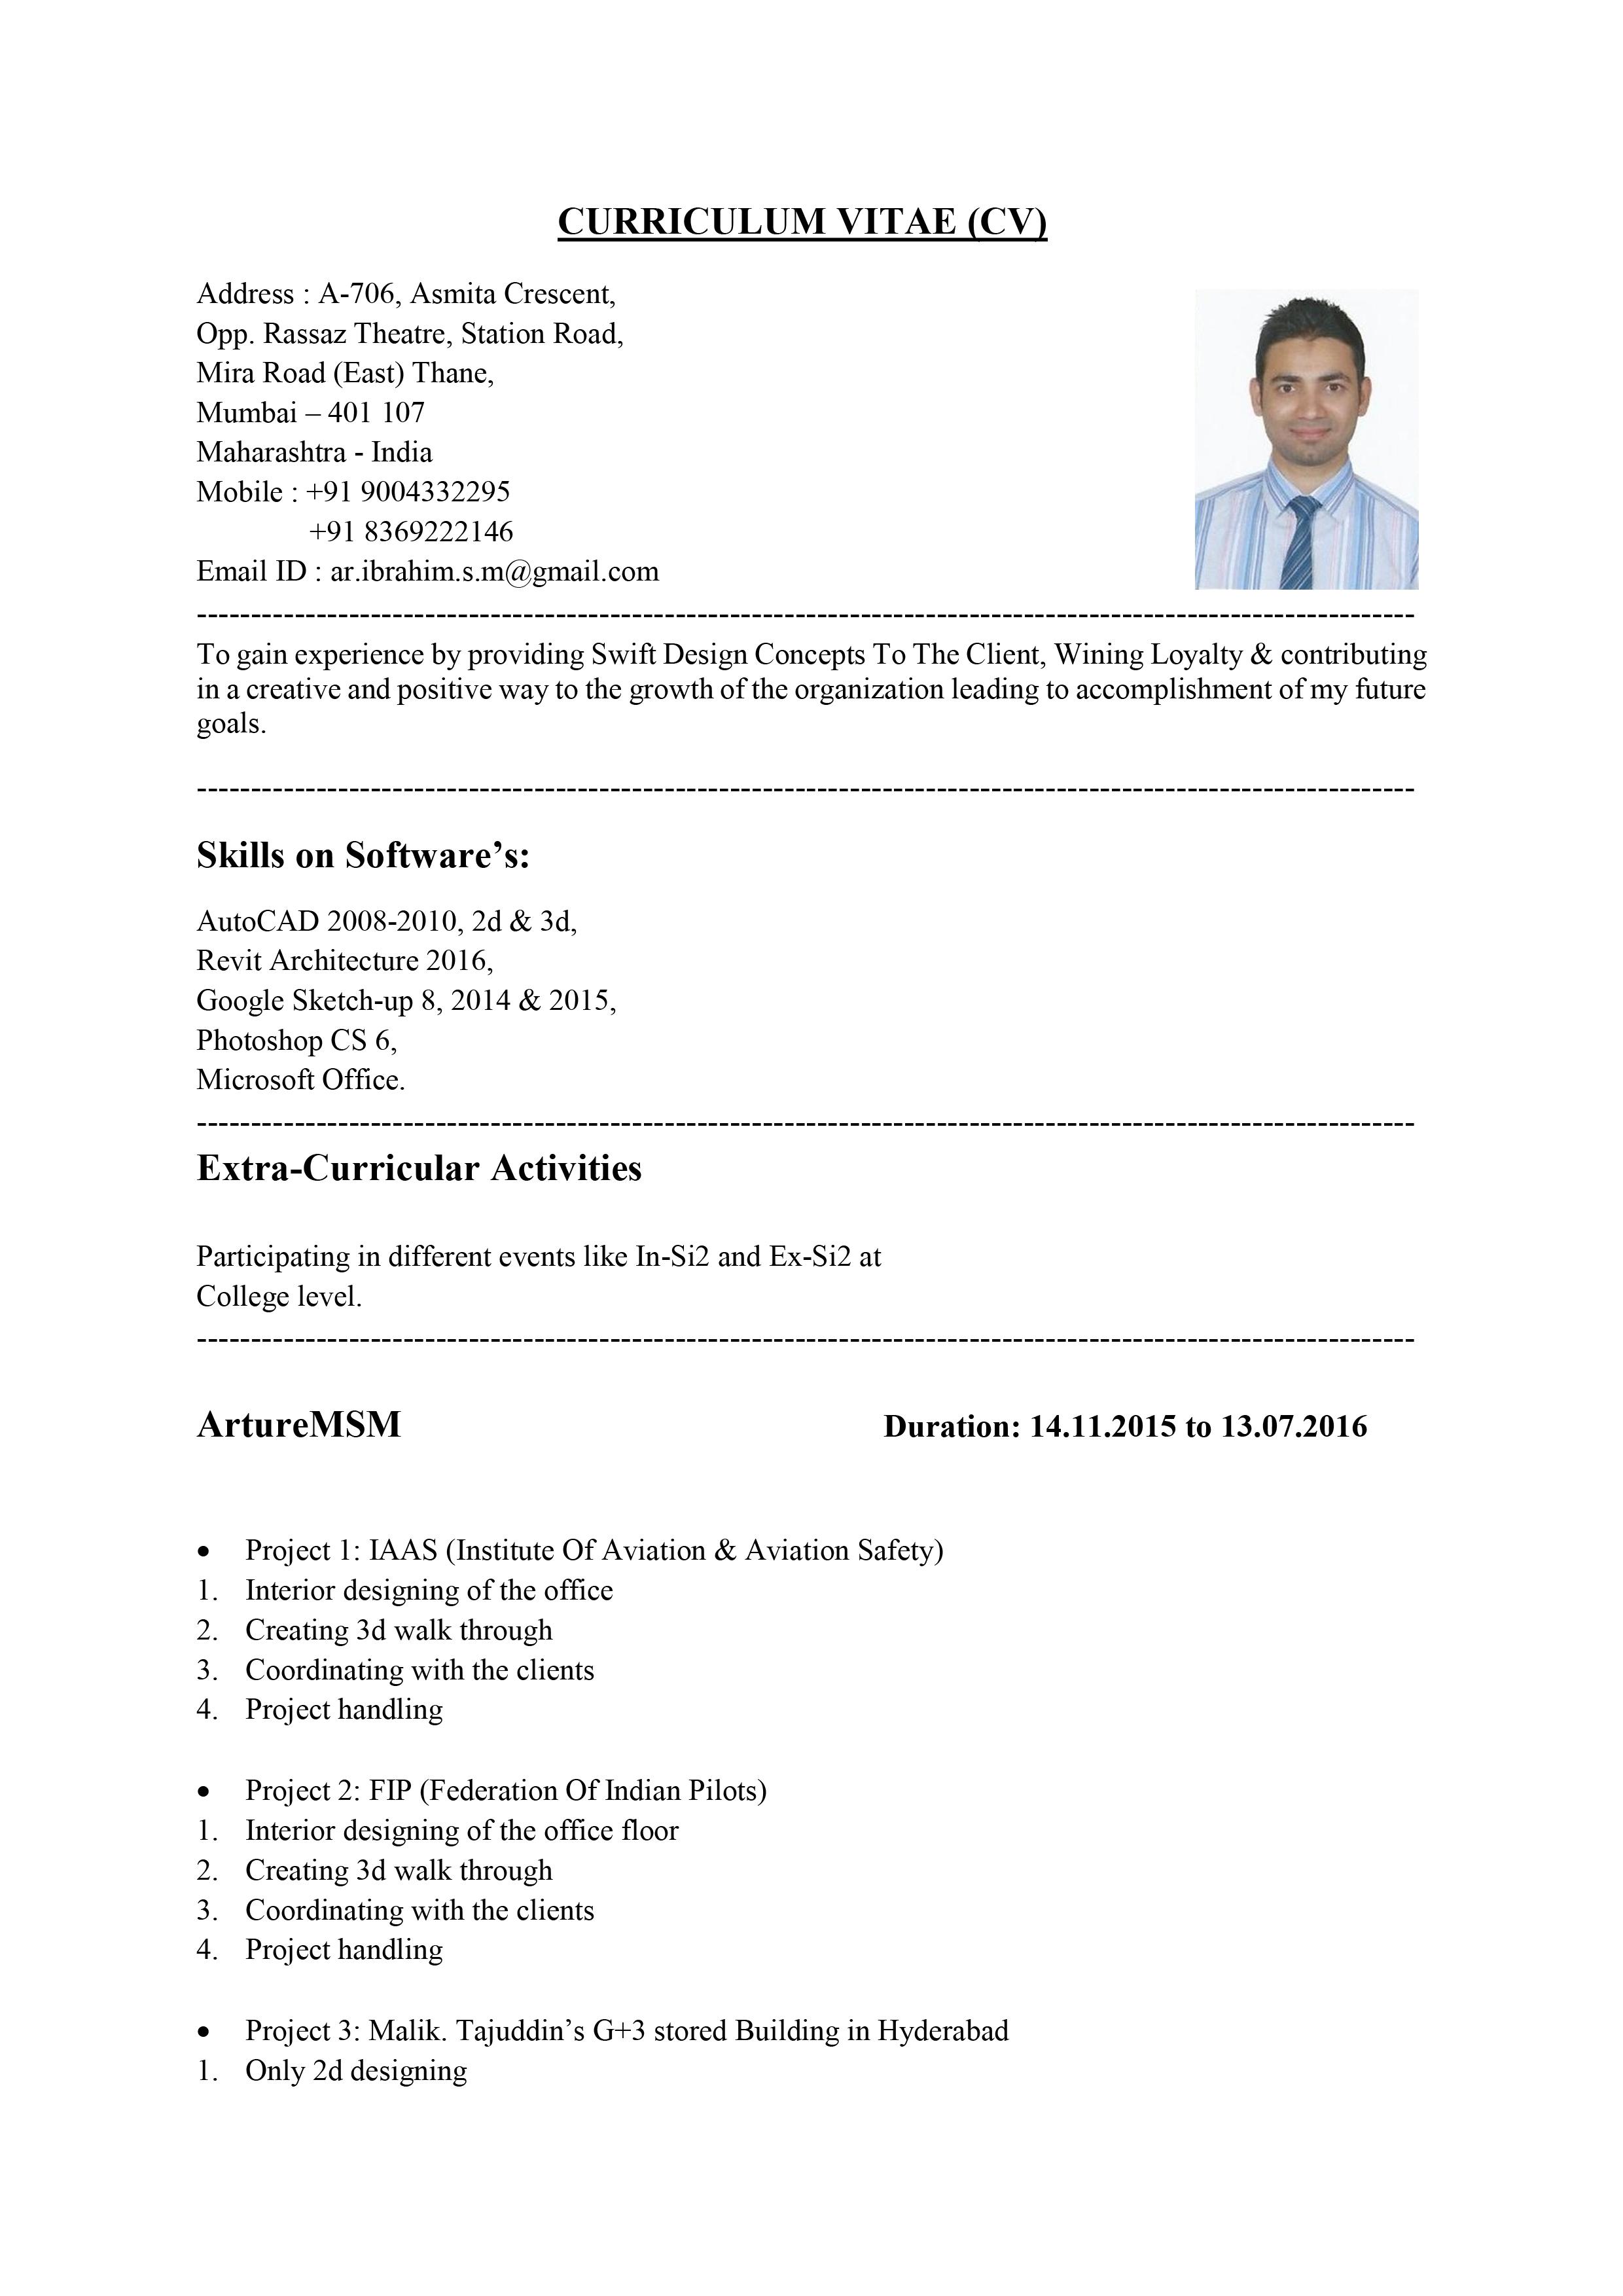 CV of Ar. Md. Ibrahim Mohiuddin pg 1